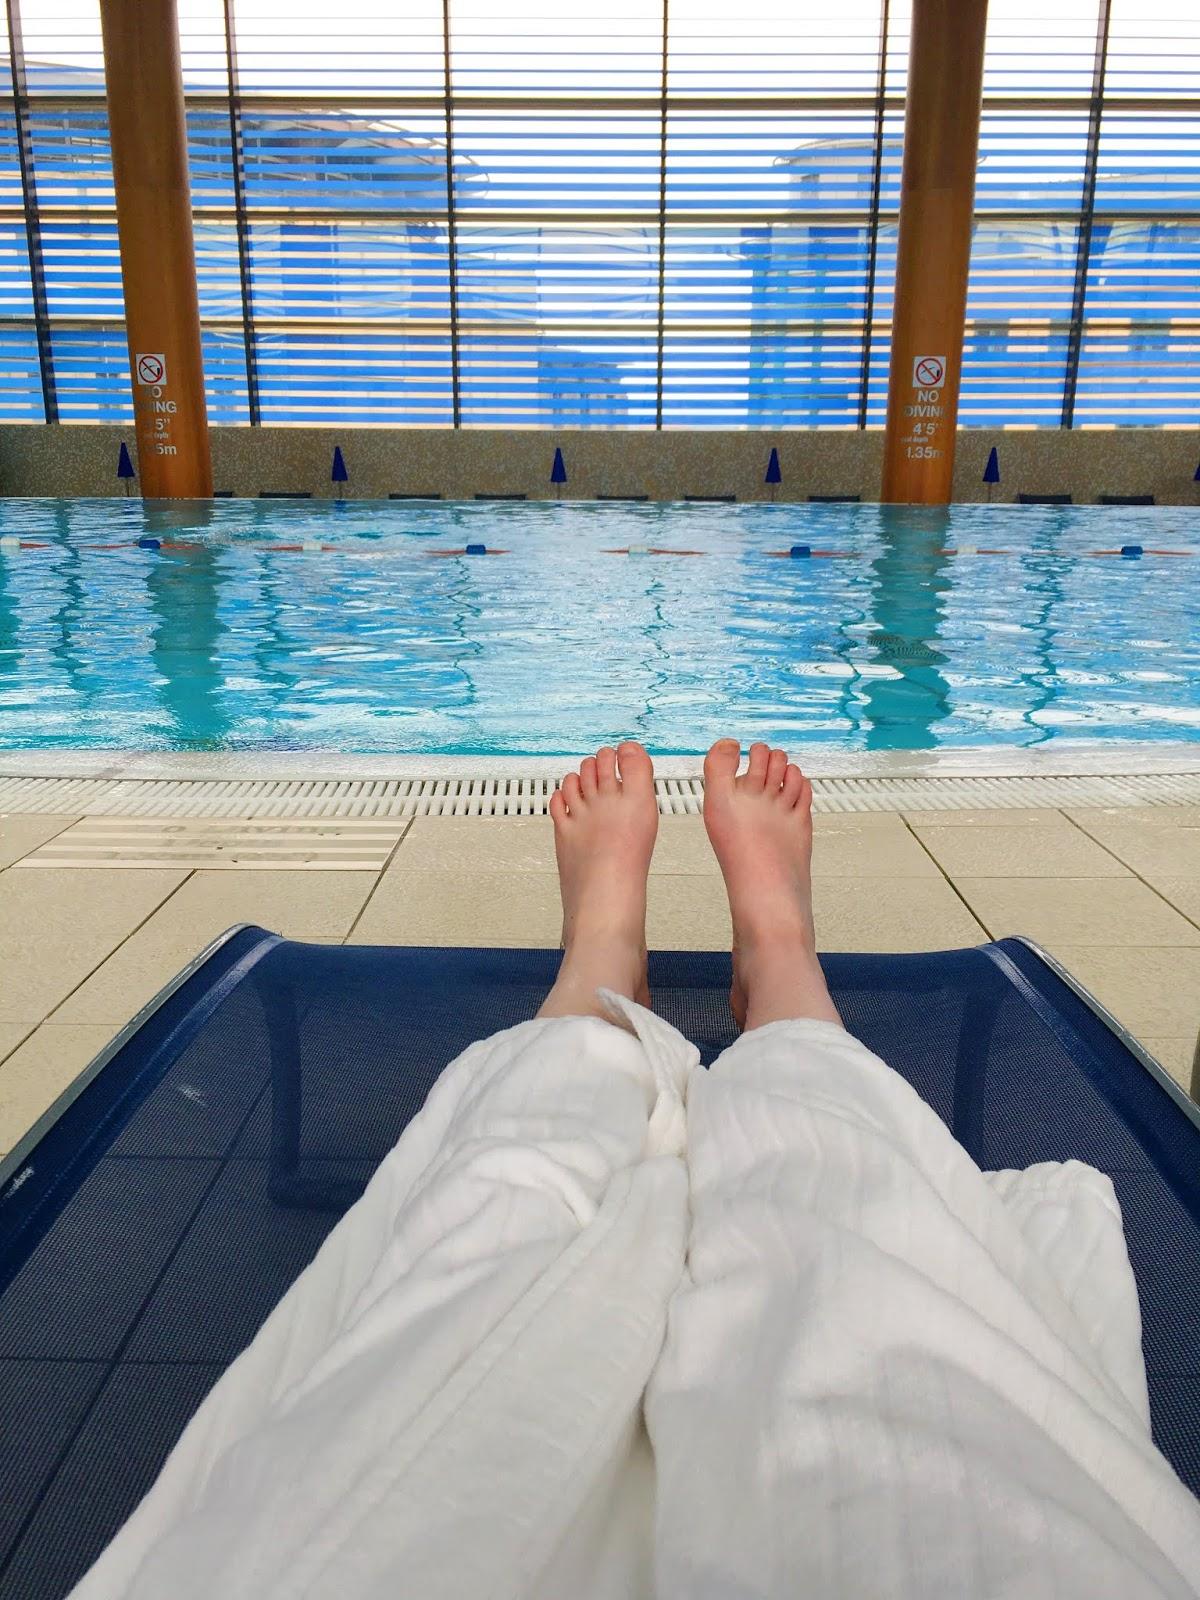 sheraton edinburgh swimming pool